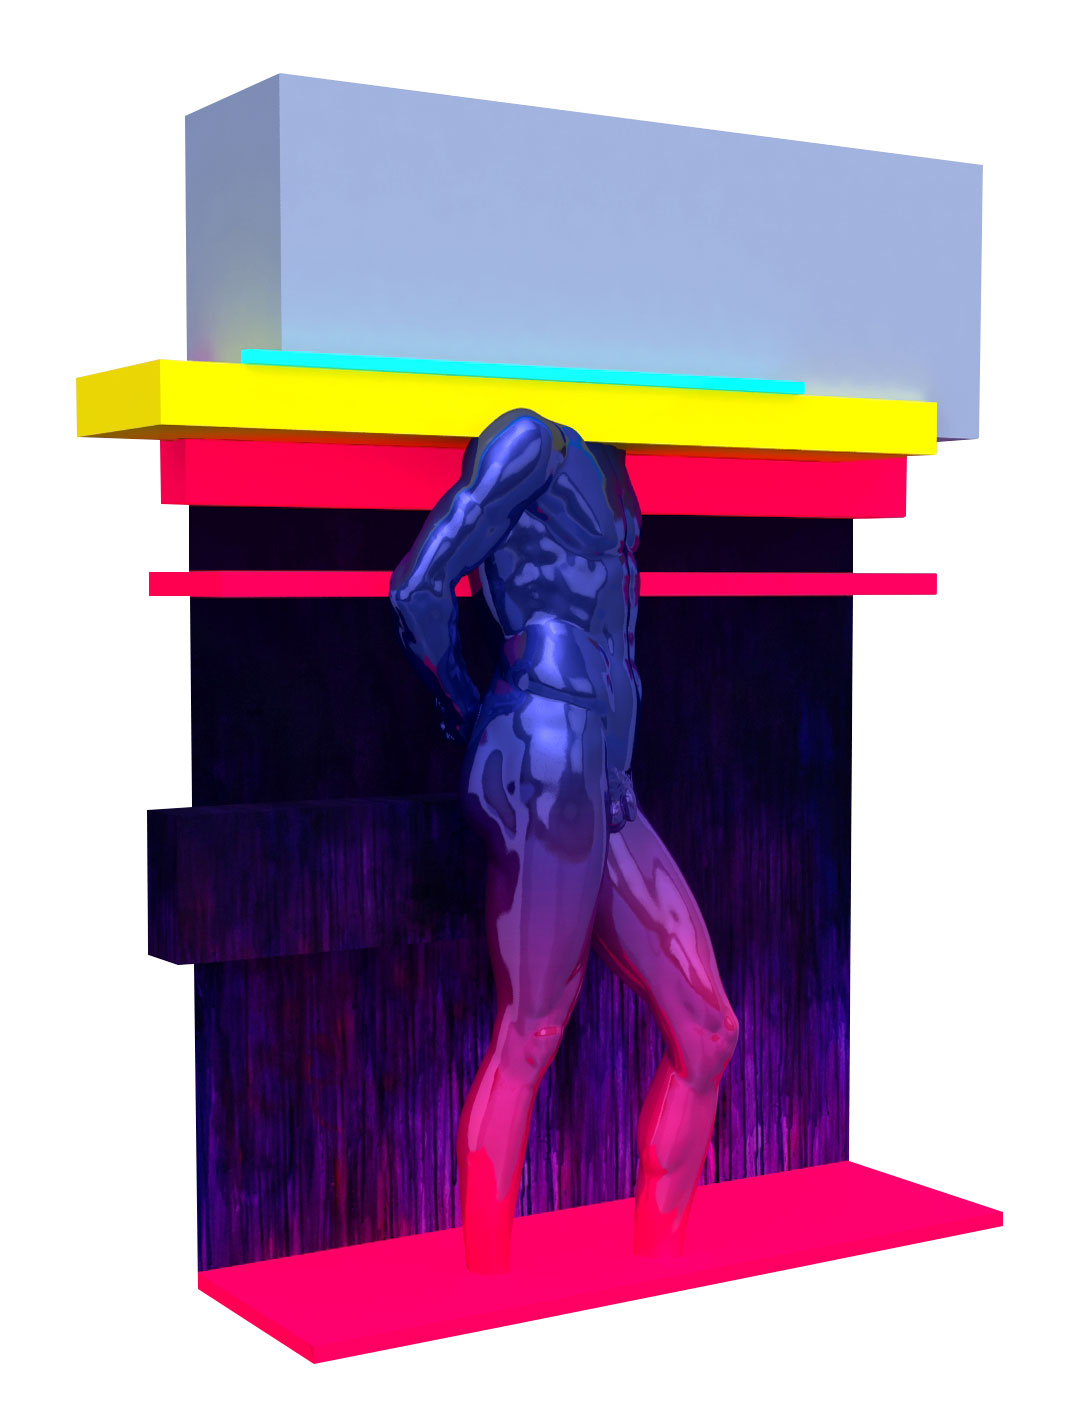 sebastian-riffo-montenegro--synthetic-mars--150x110cm-digital